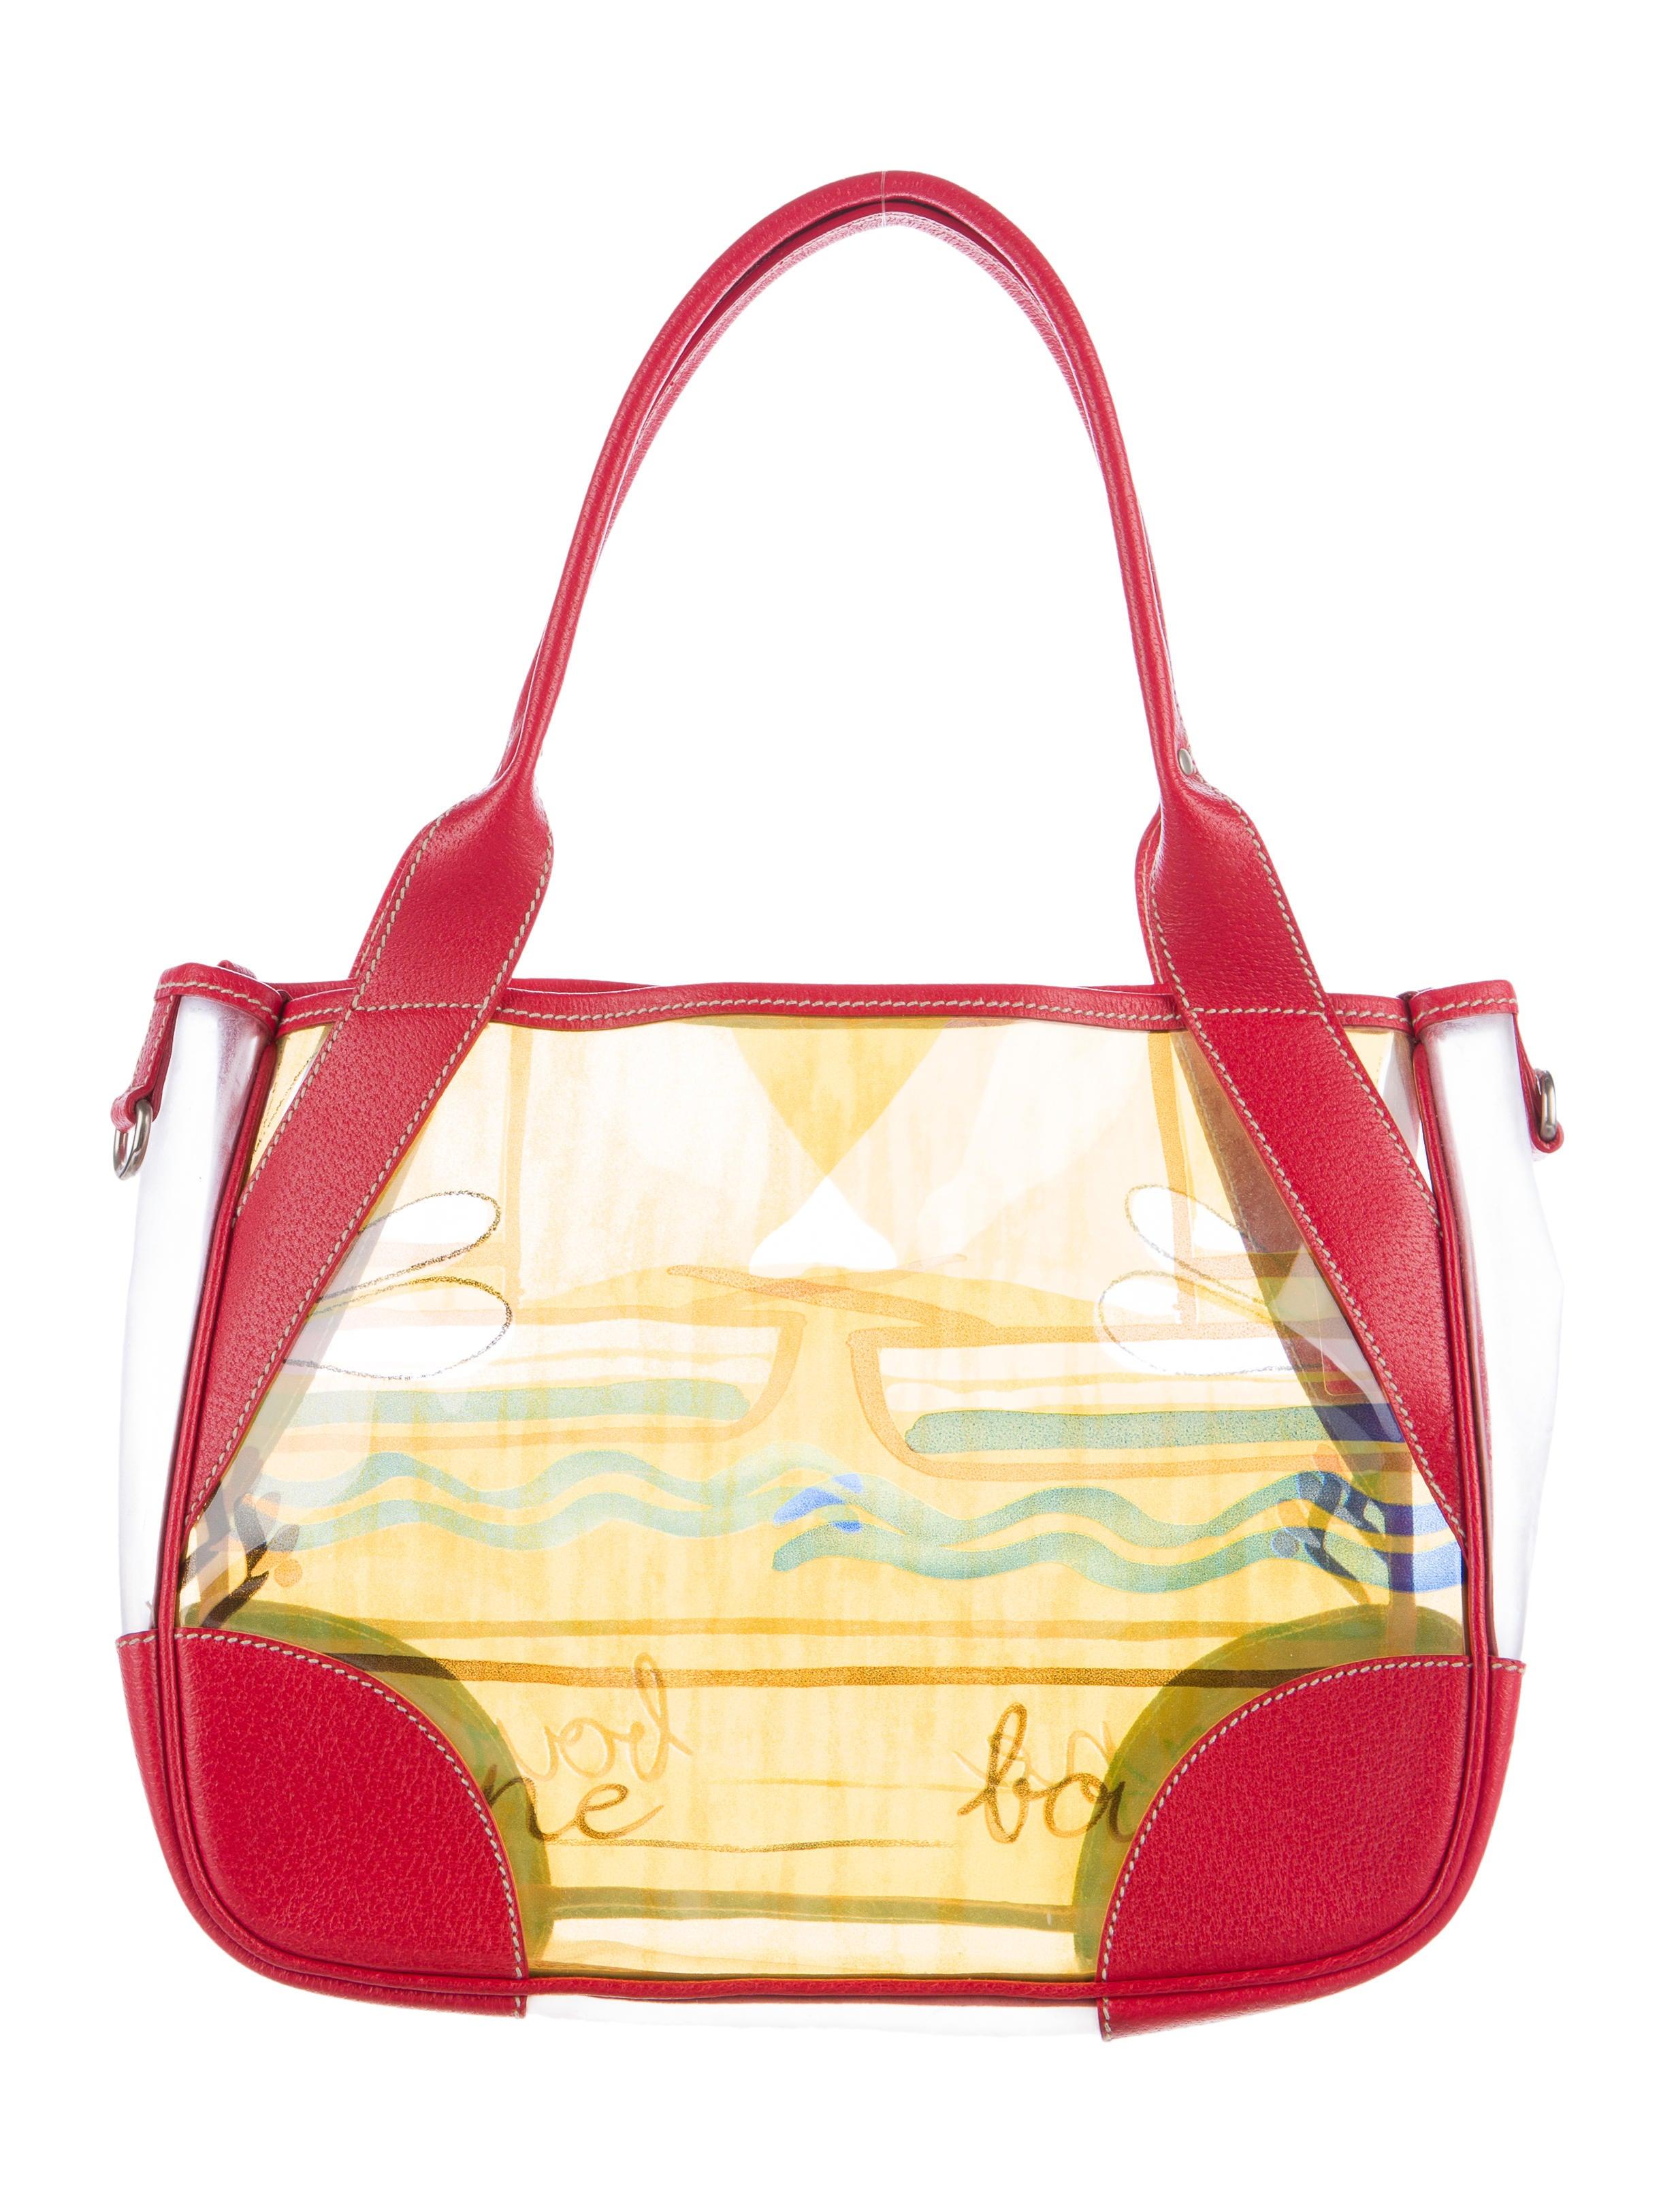 Prada Vinyl Beach Bag Handbags Pra146701 The Realreal